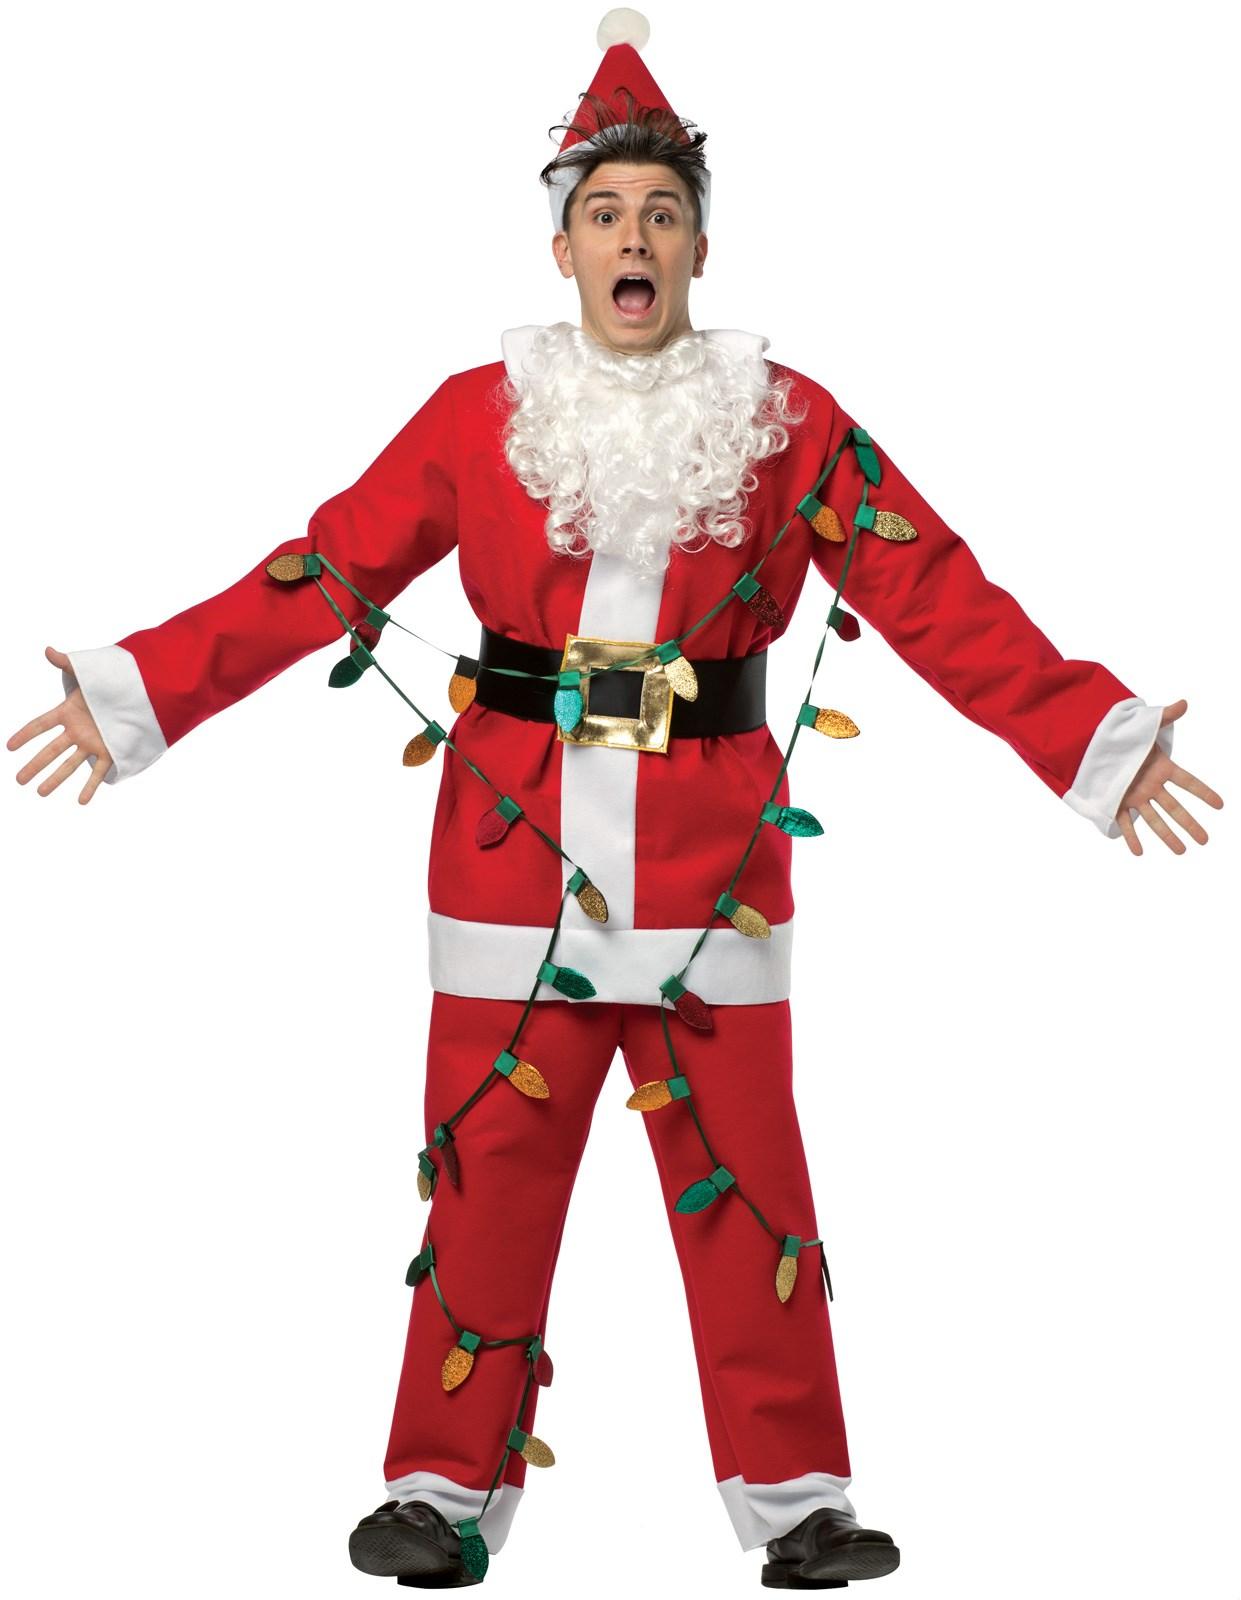 National Lampoons Christmas Vacation - Adult Light Up Santa Costume